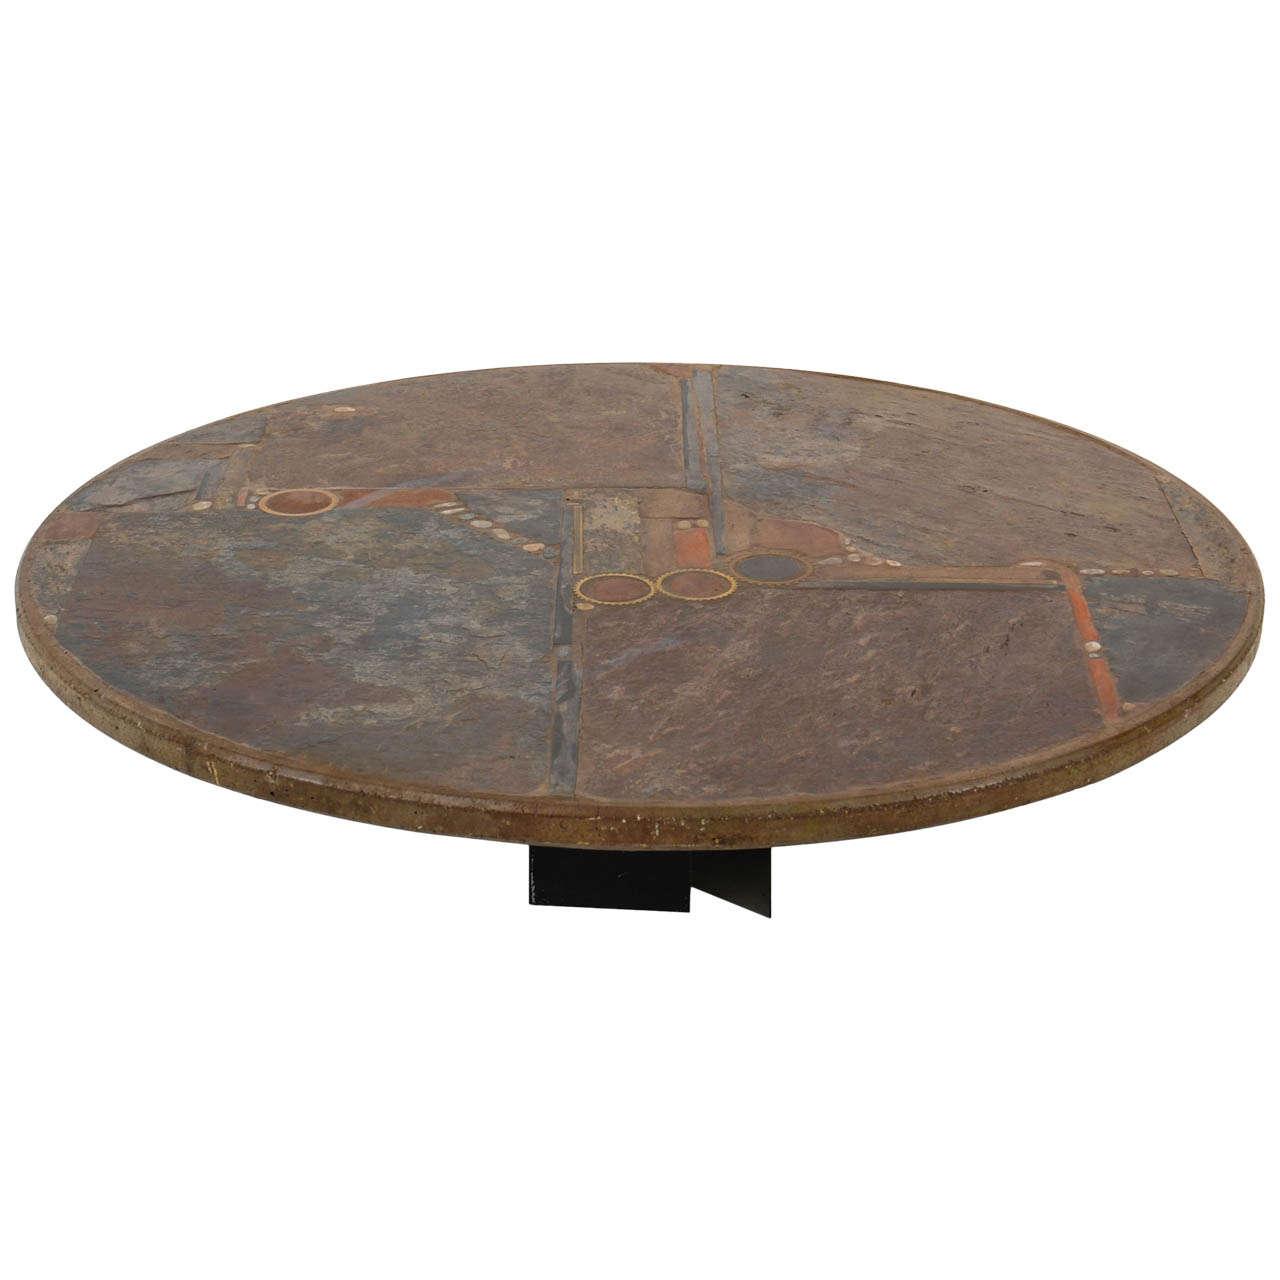 Large Signed Paul Kingma 1984 Slate Stone Round Coffeetable At 1stdibs